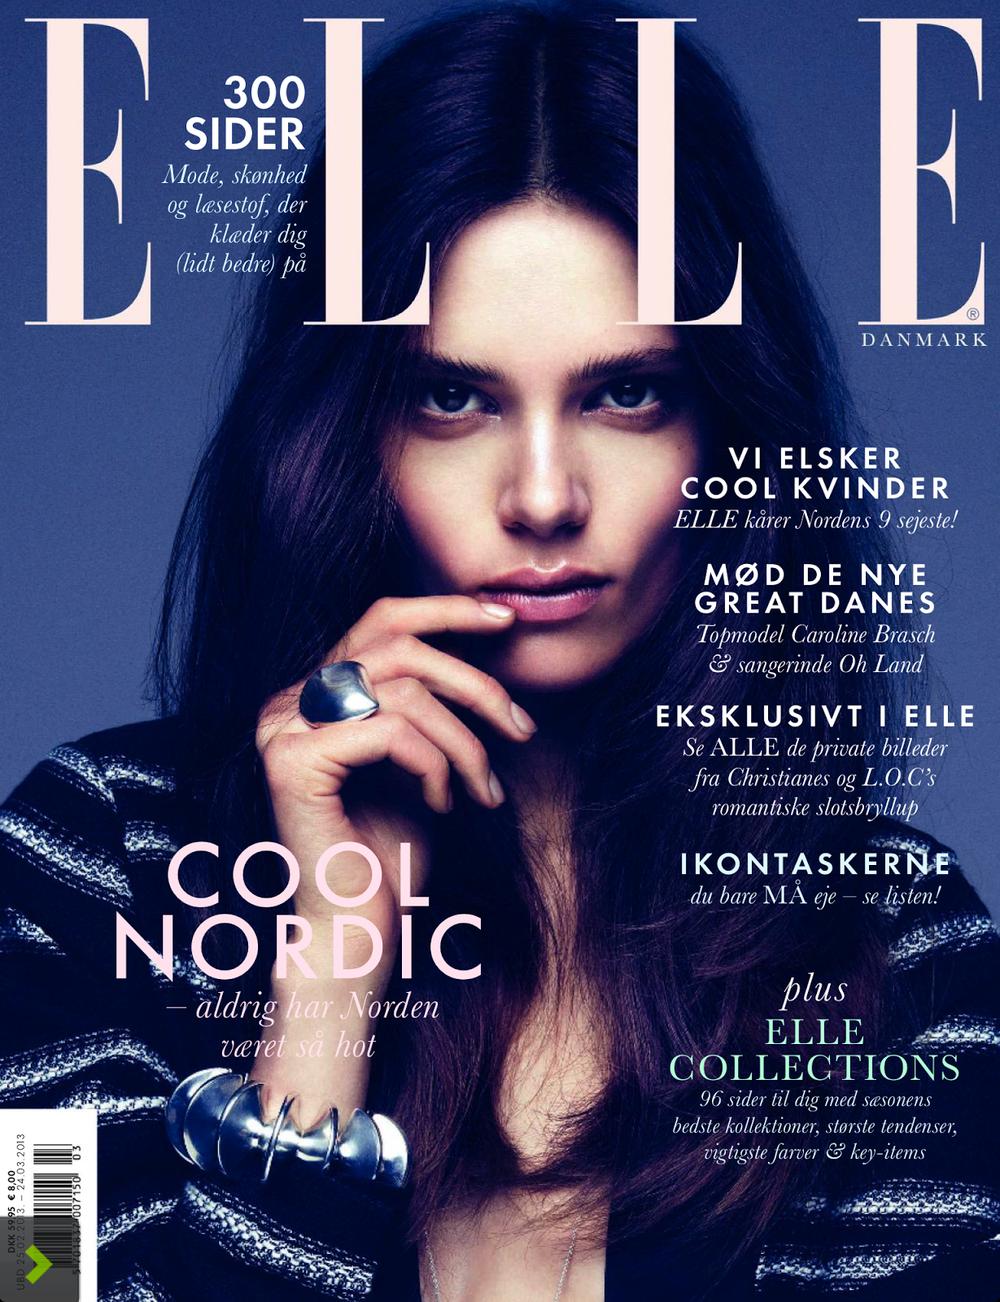 ELLE COVER & EDITORIALS